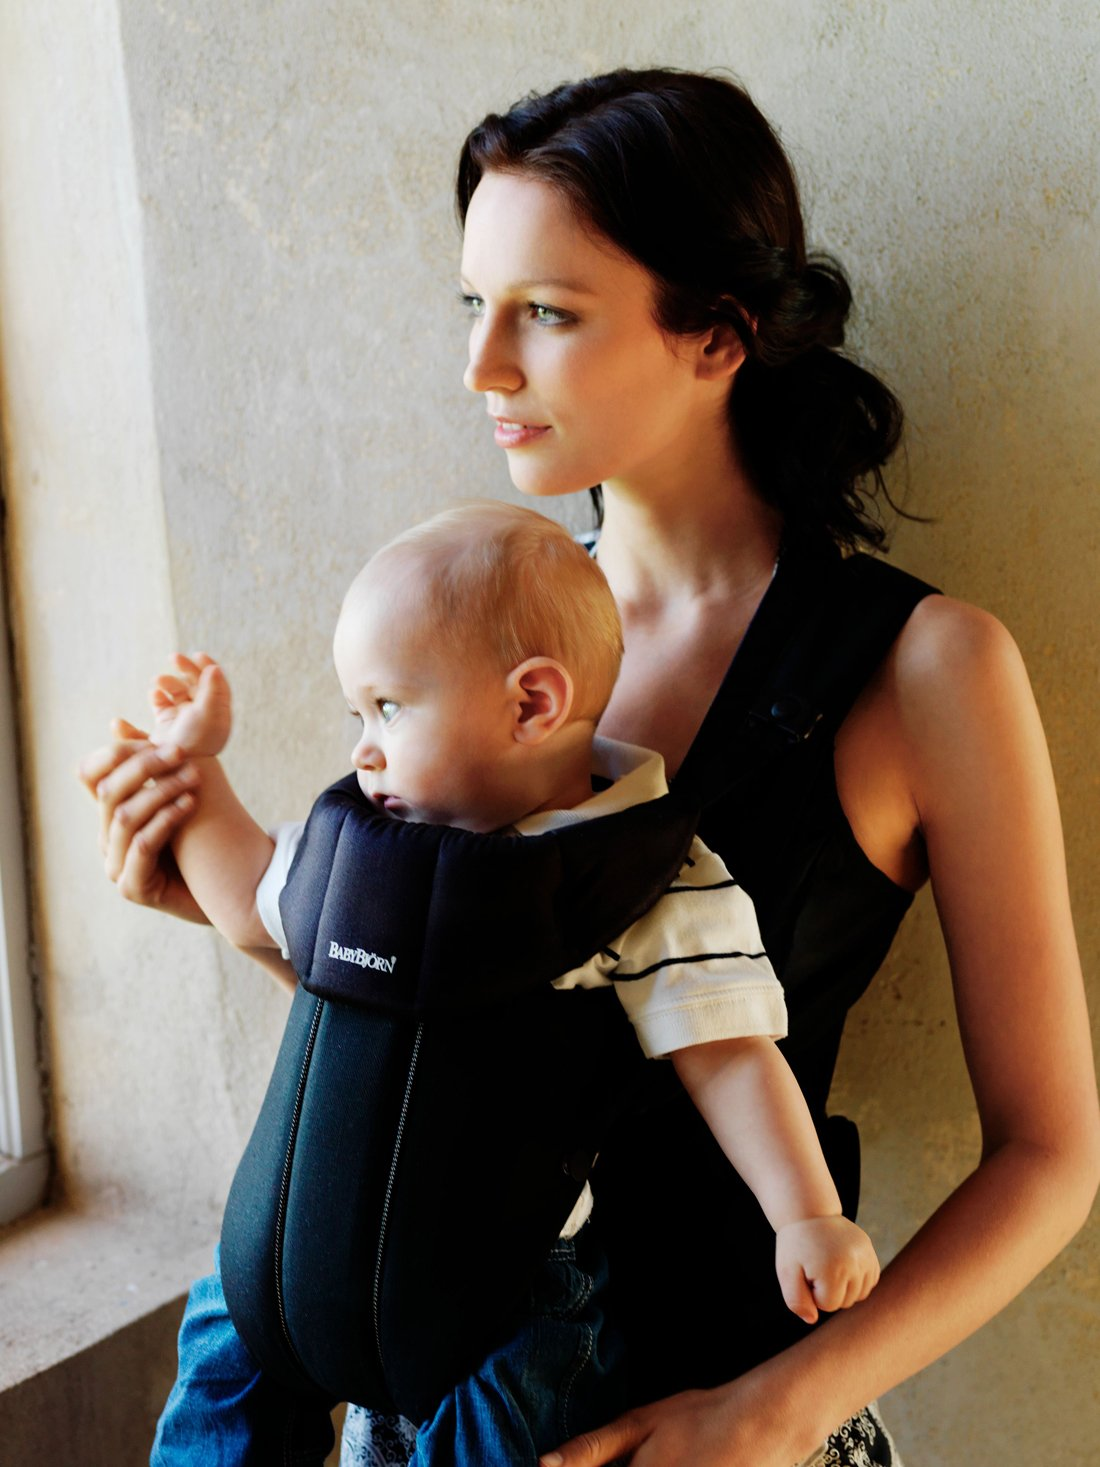 ad084345d21 BabyBjorn Baby Carrier Active (Black Black)  Amazon.ca  Baby